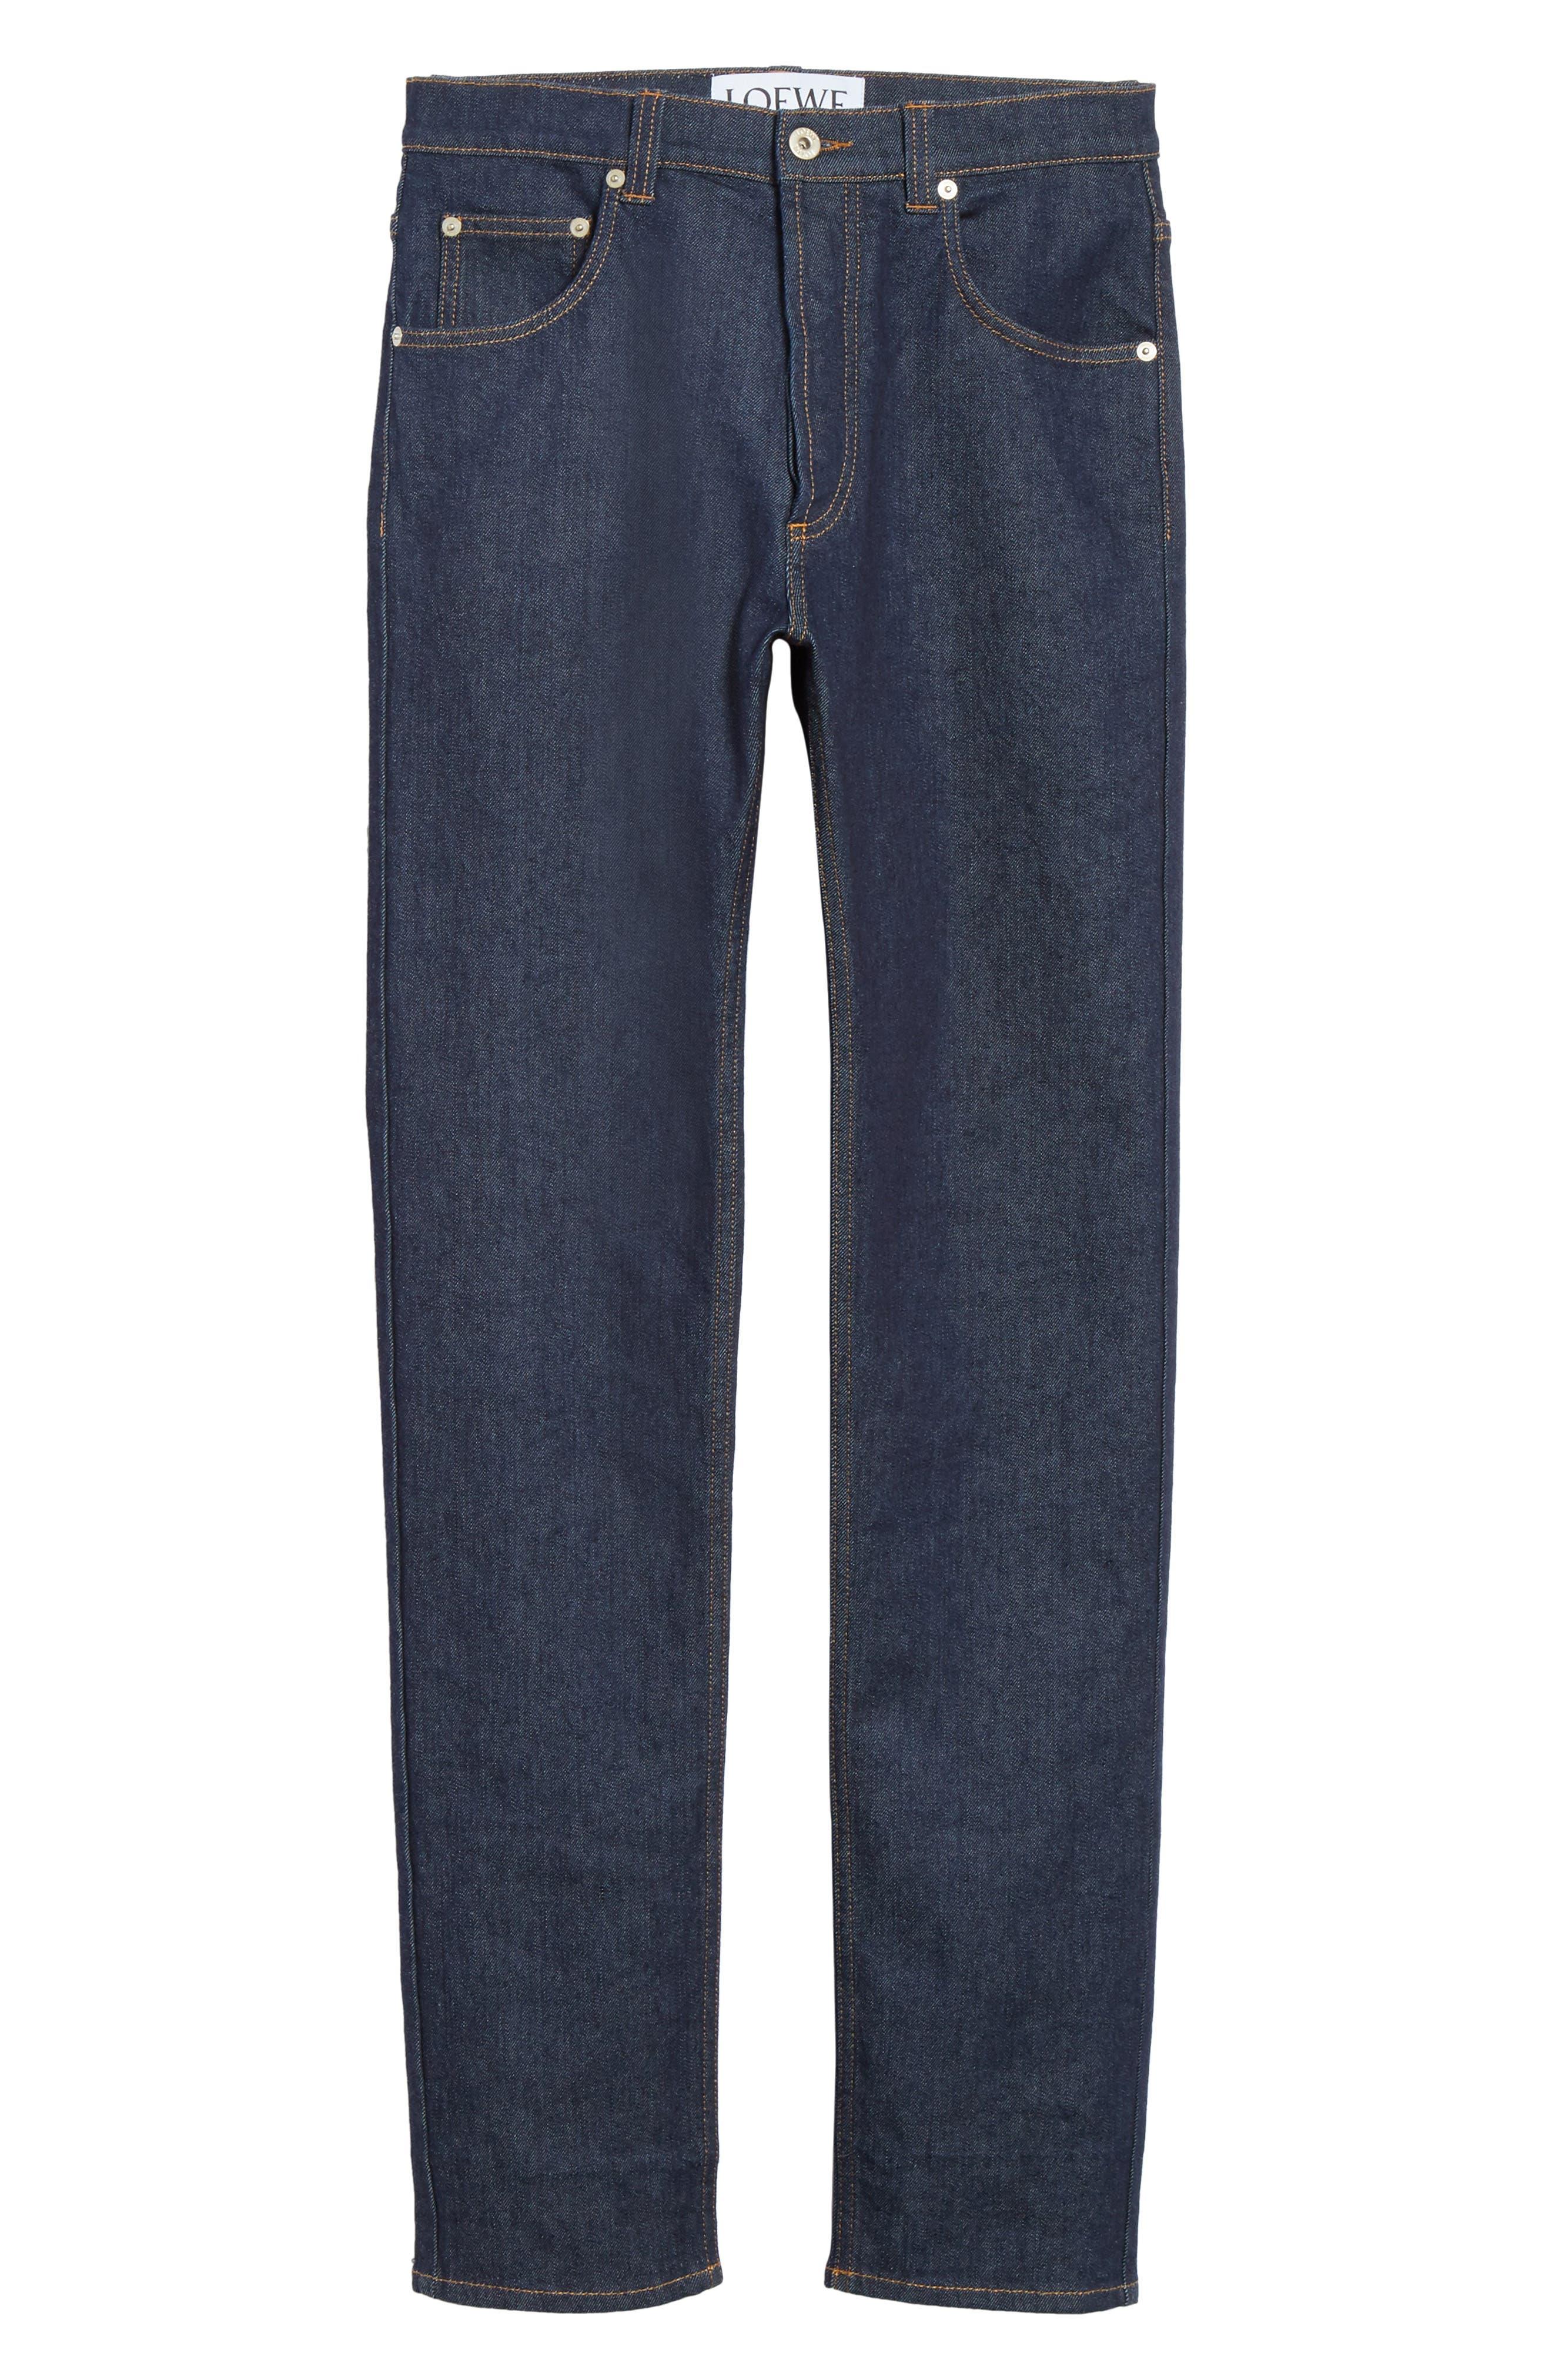 LOEWE, Skinny Fit Jeans, Alternate thumbnail 6, color, BLUE DENIM